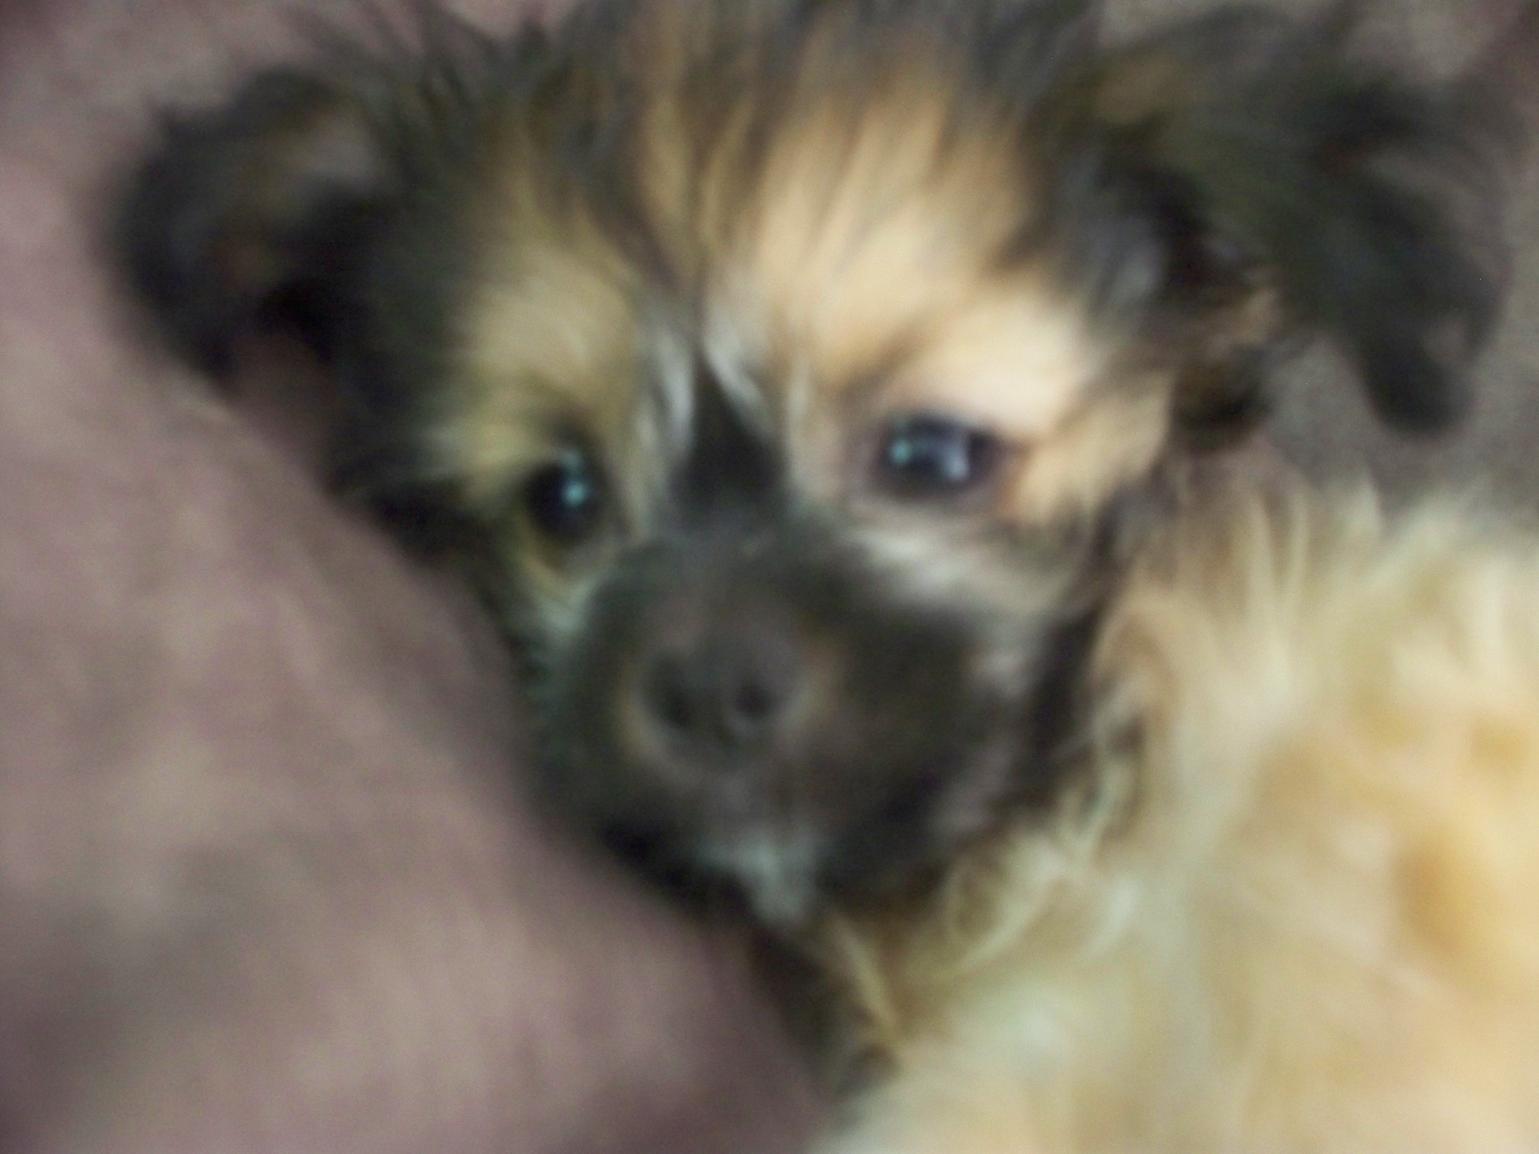 Chihuahua Shih Tzu Mix puppy-175.jpg